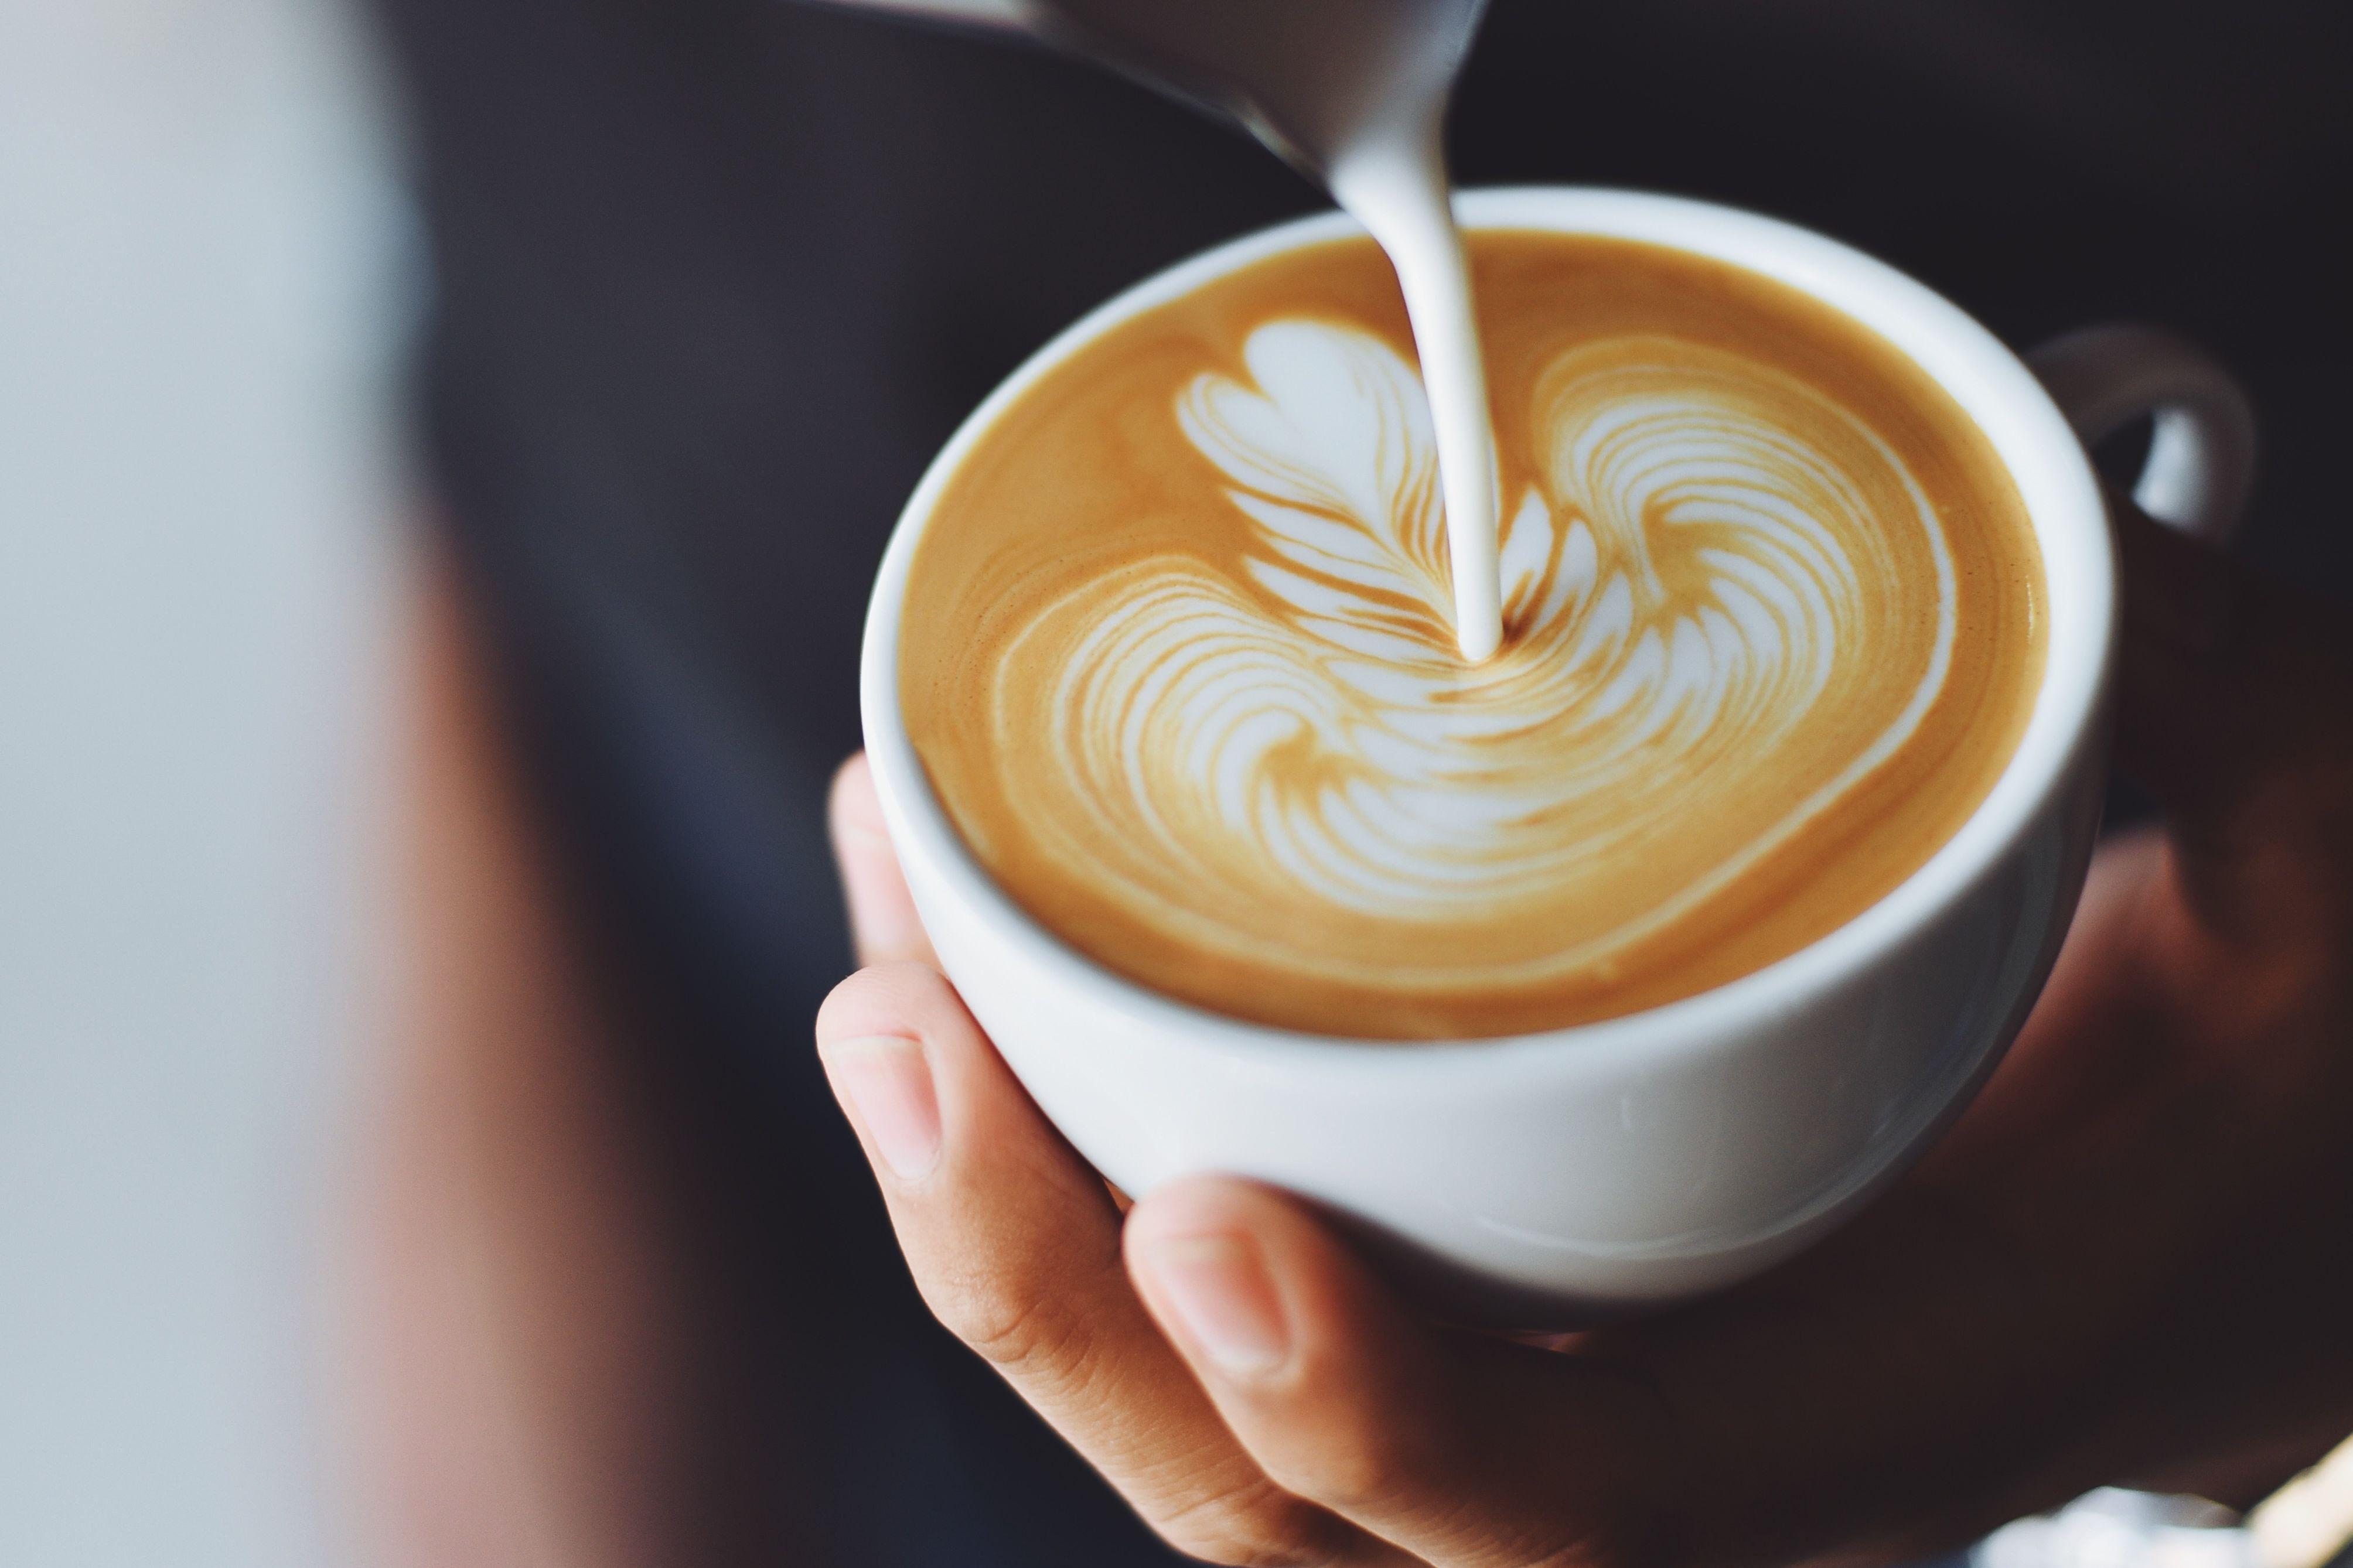 Coffee noovfh